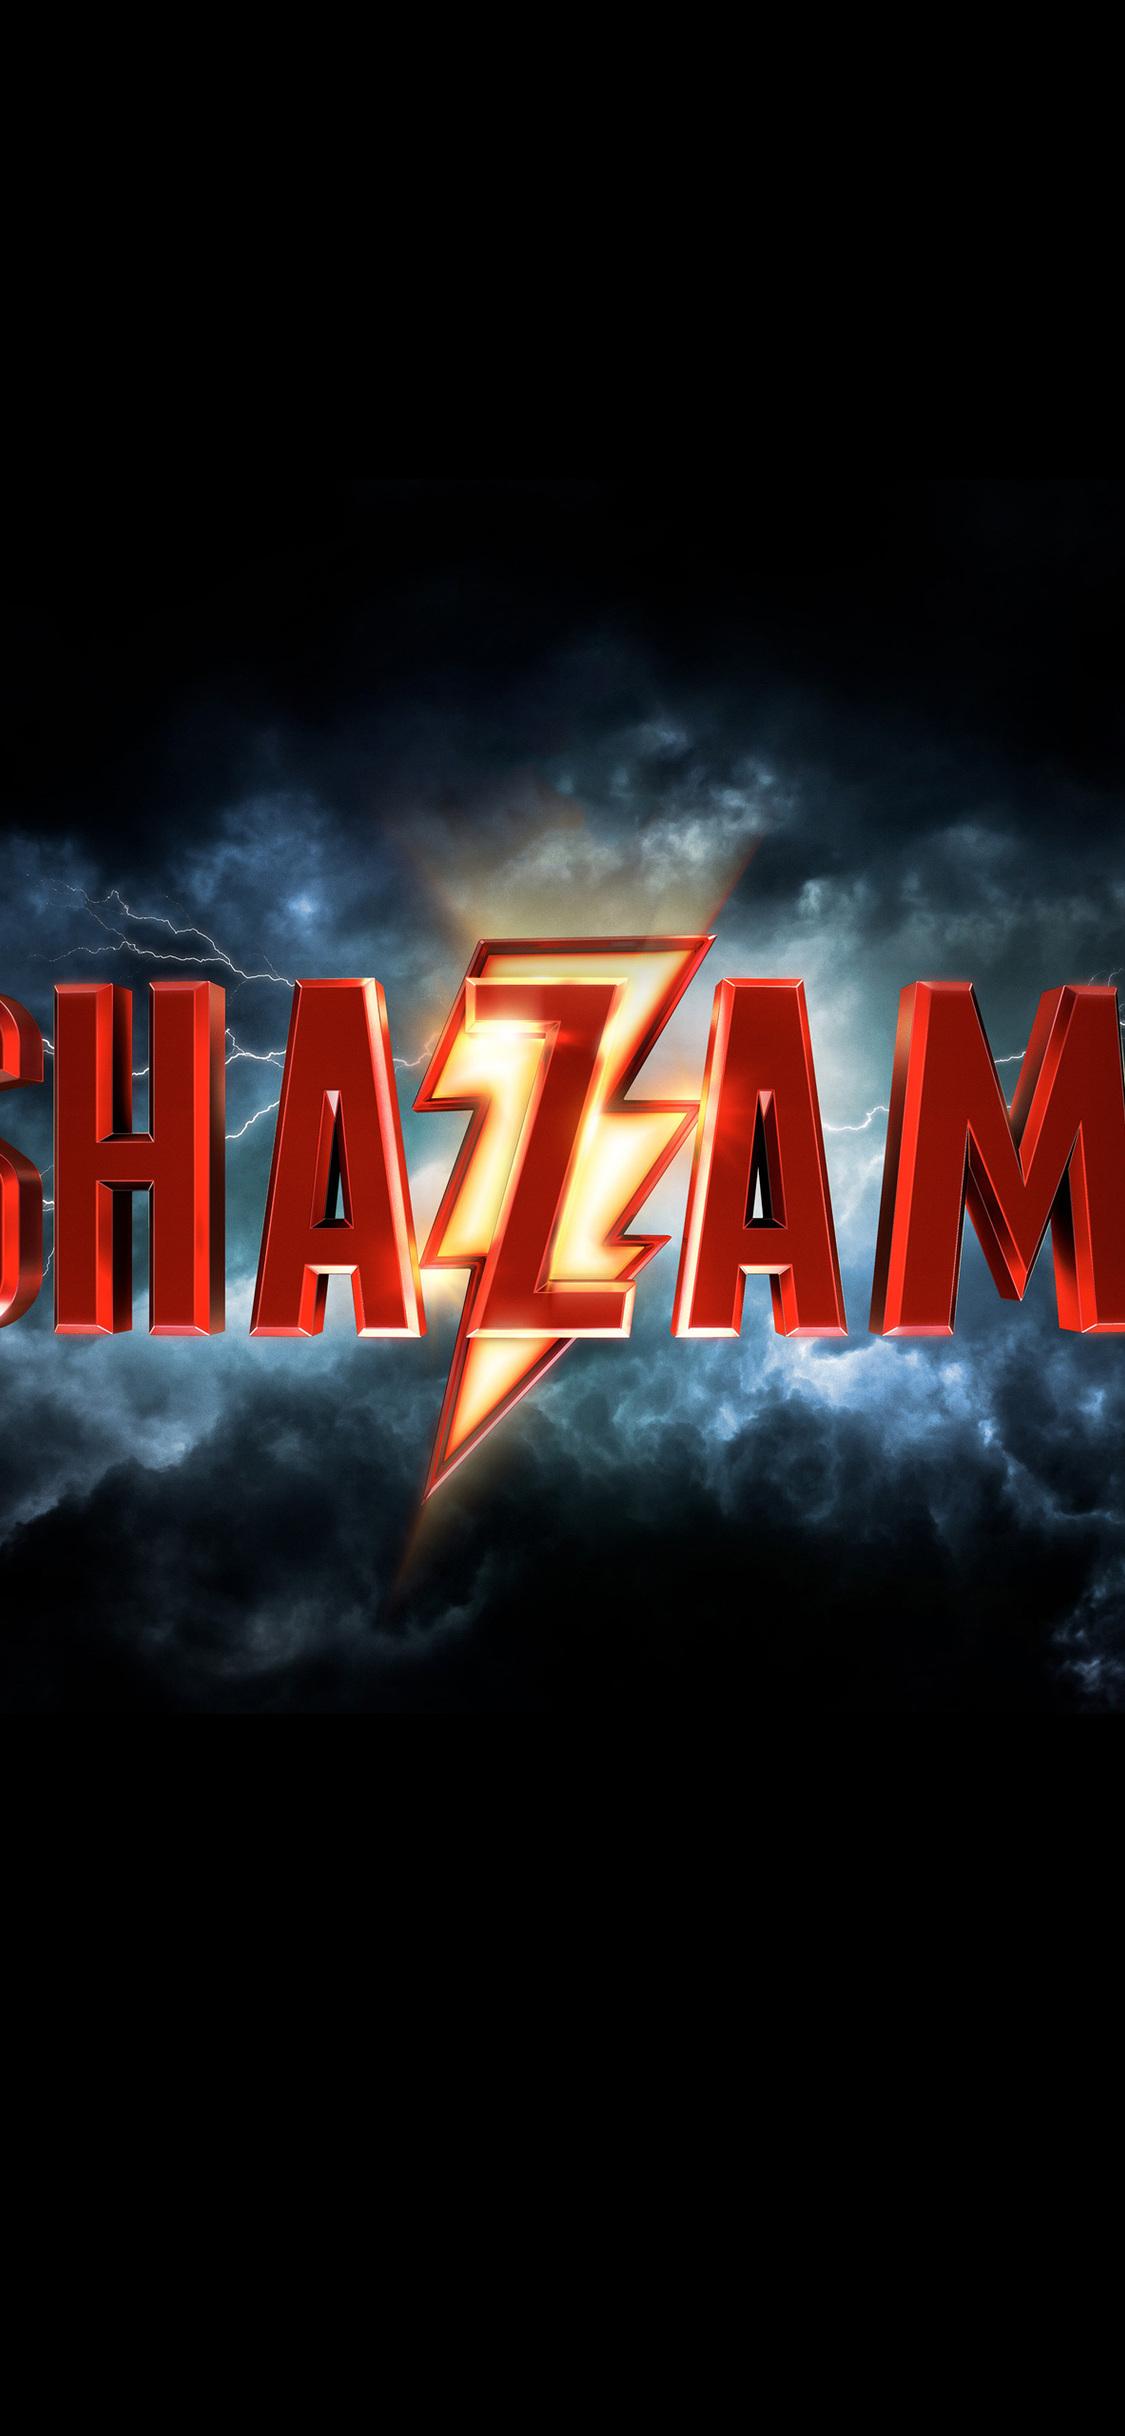 1125x2436 Shazam 2019 Movie Logo Iphone Xs Iphone 10 Iphone X Hd 4k